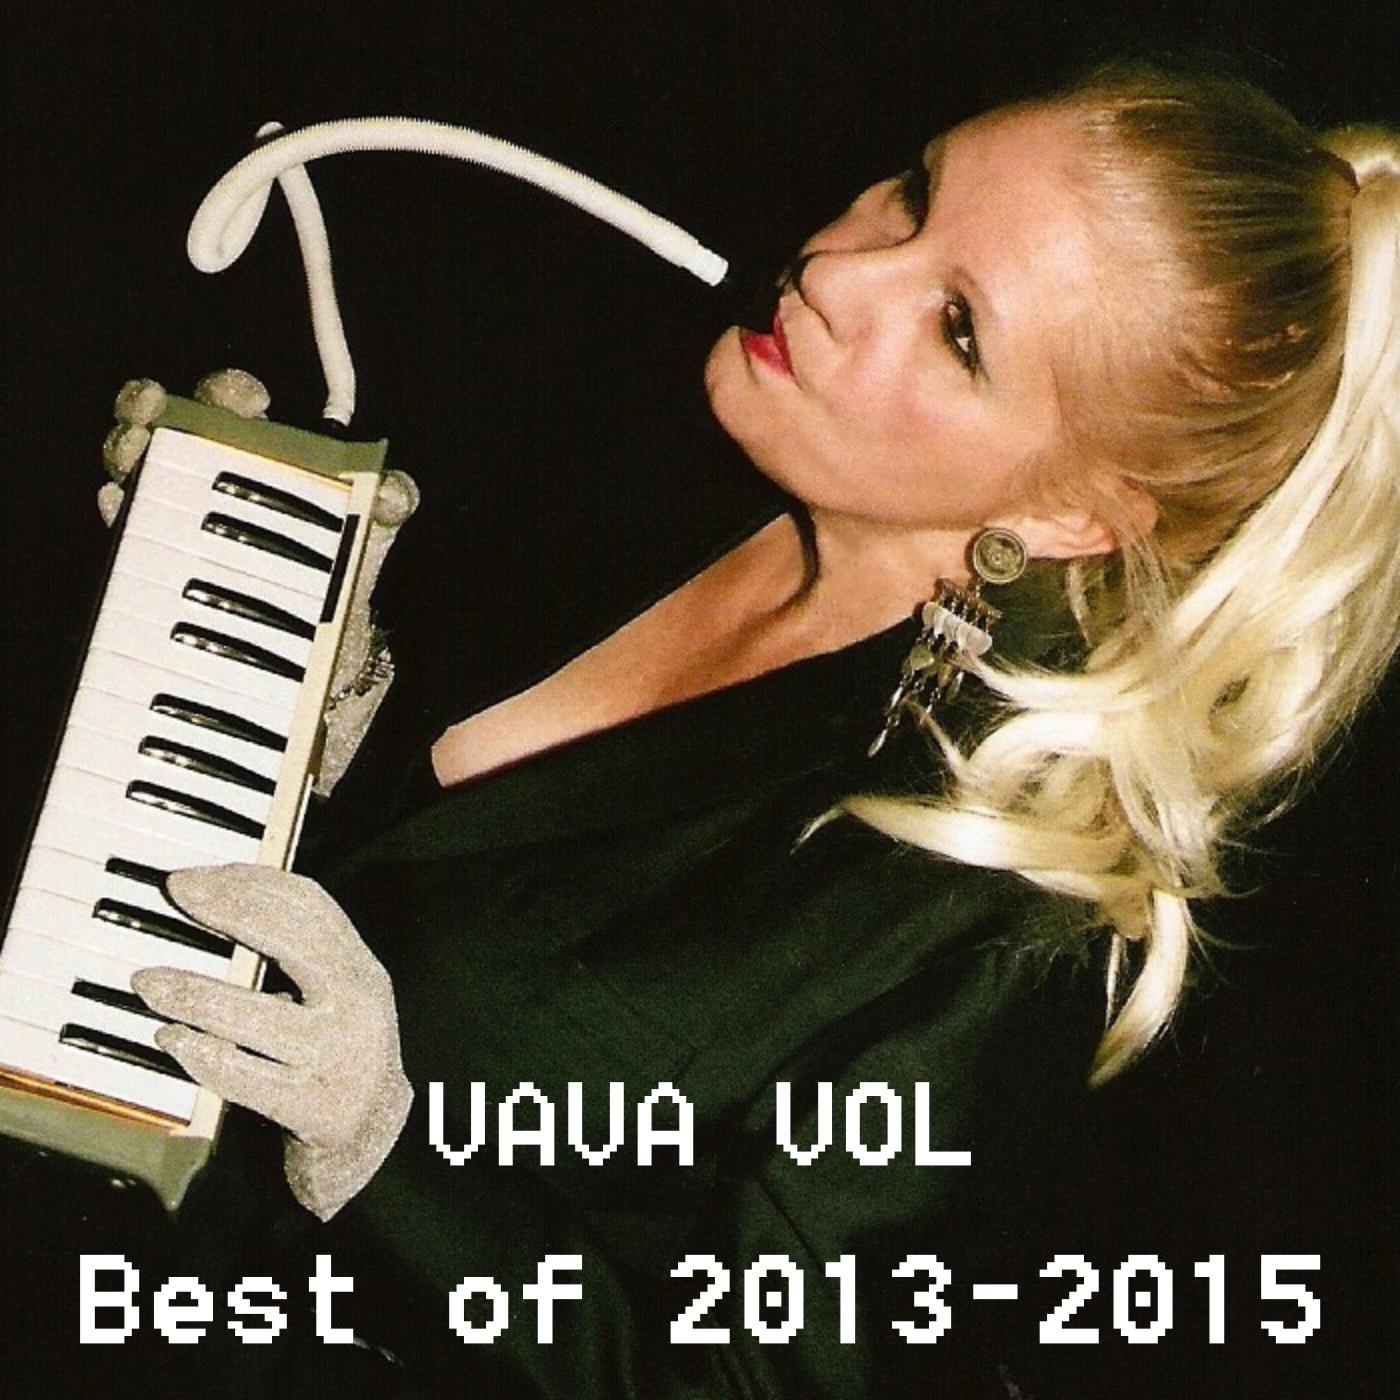 VàVà Vol's Vavaland - News, Videos, Music and Art from around the